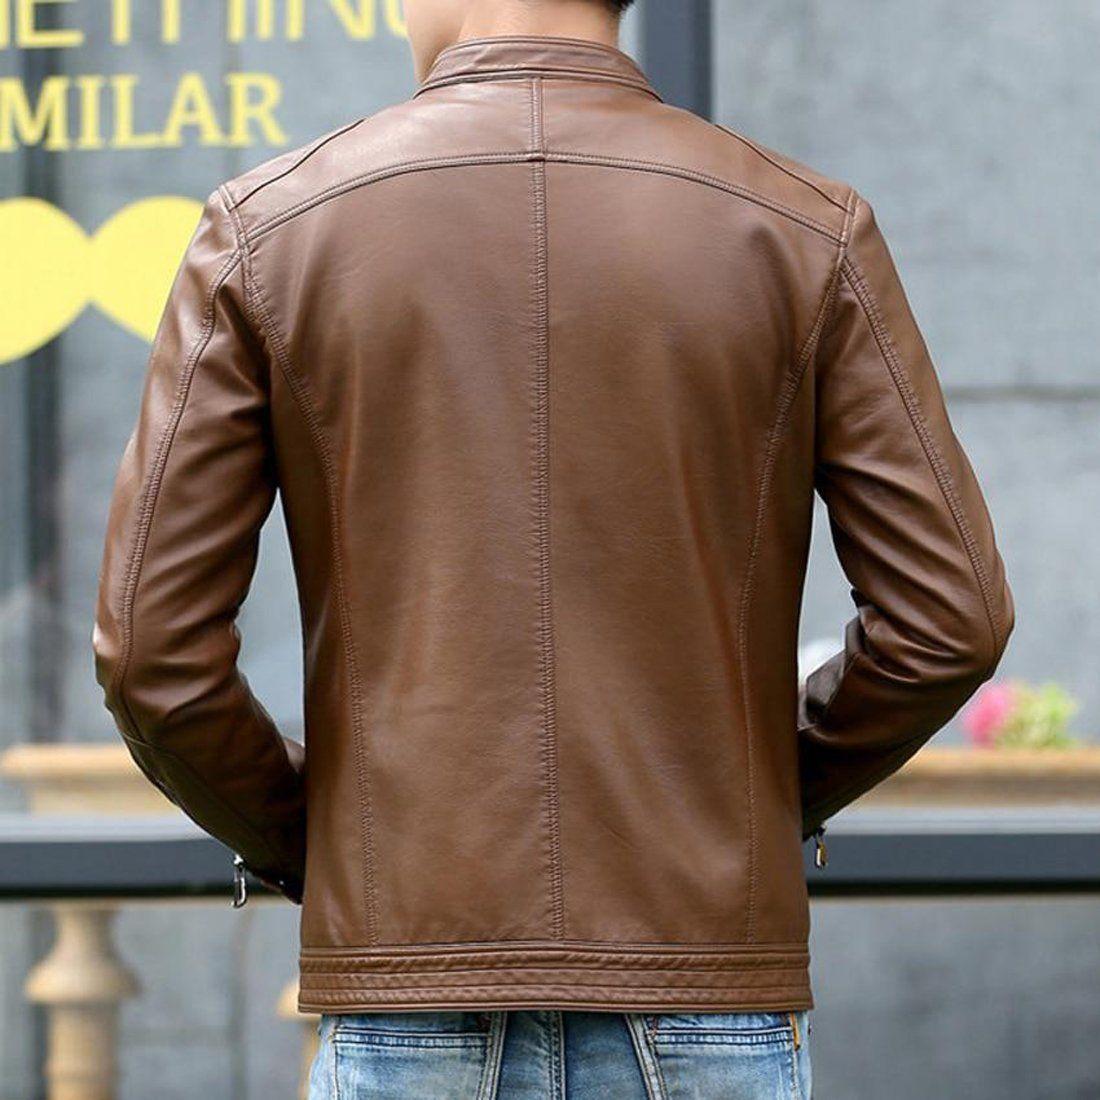 Men S Leather Jacket Stand Collar Casual Slim Motorcycle Men S Leather Jacket Leather Jacket Leather Jacket Men [ 1100 x 1100 Pixel ]